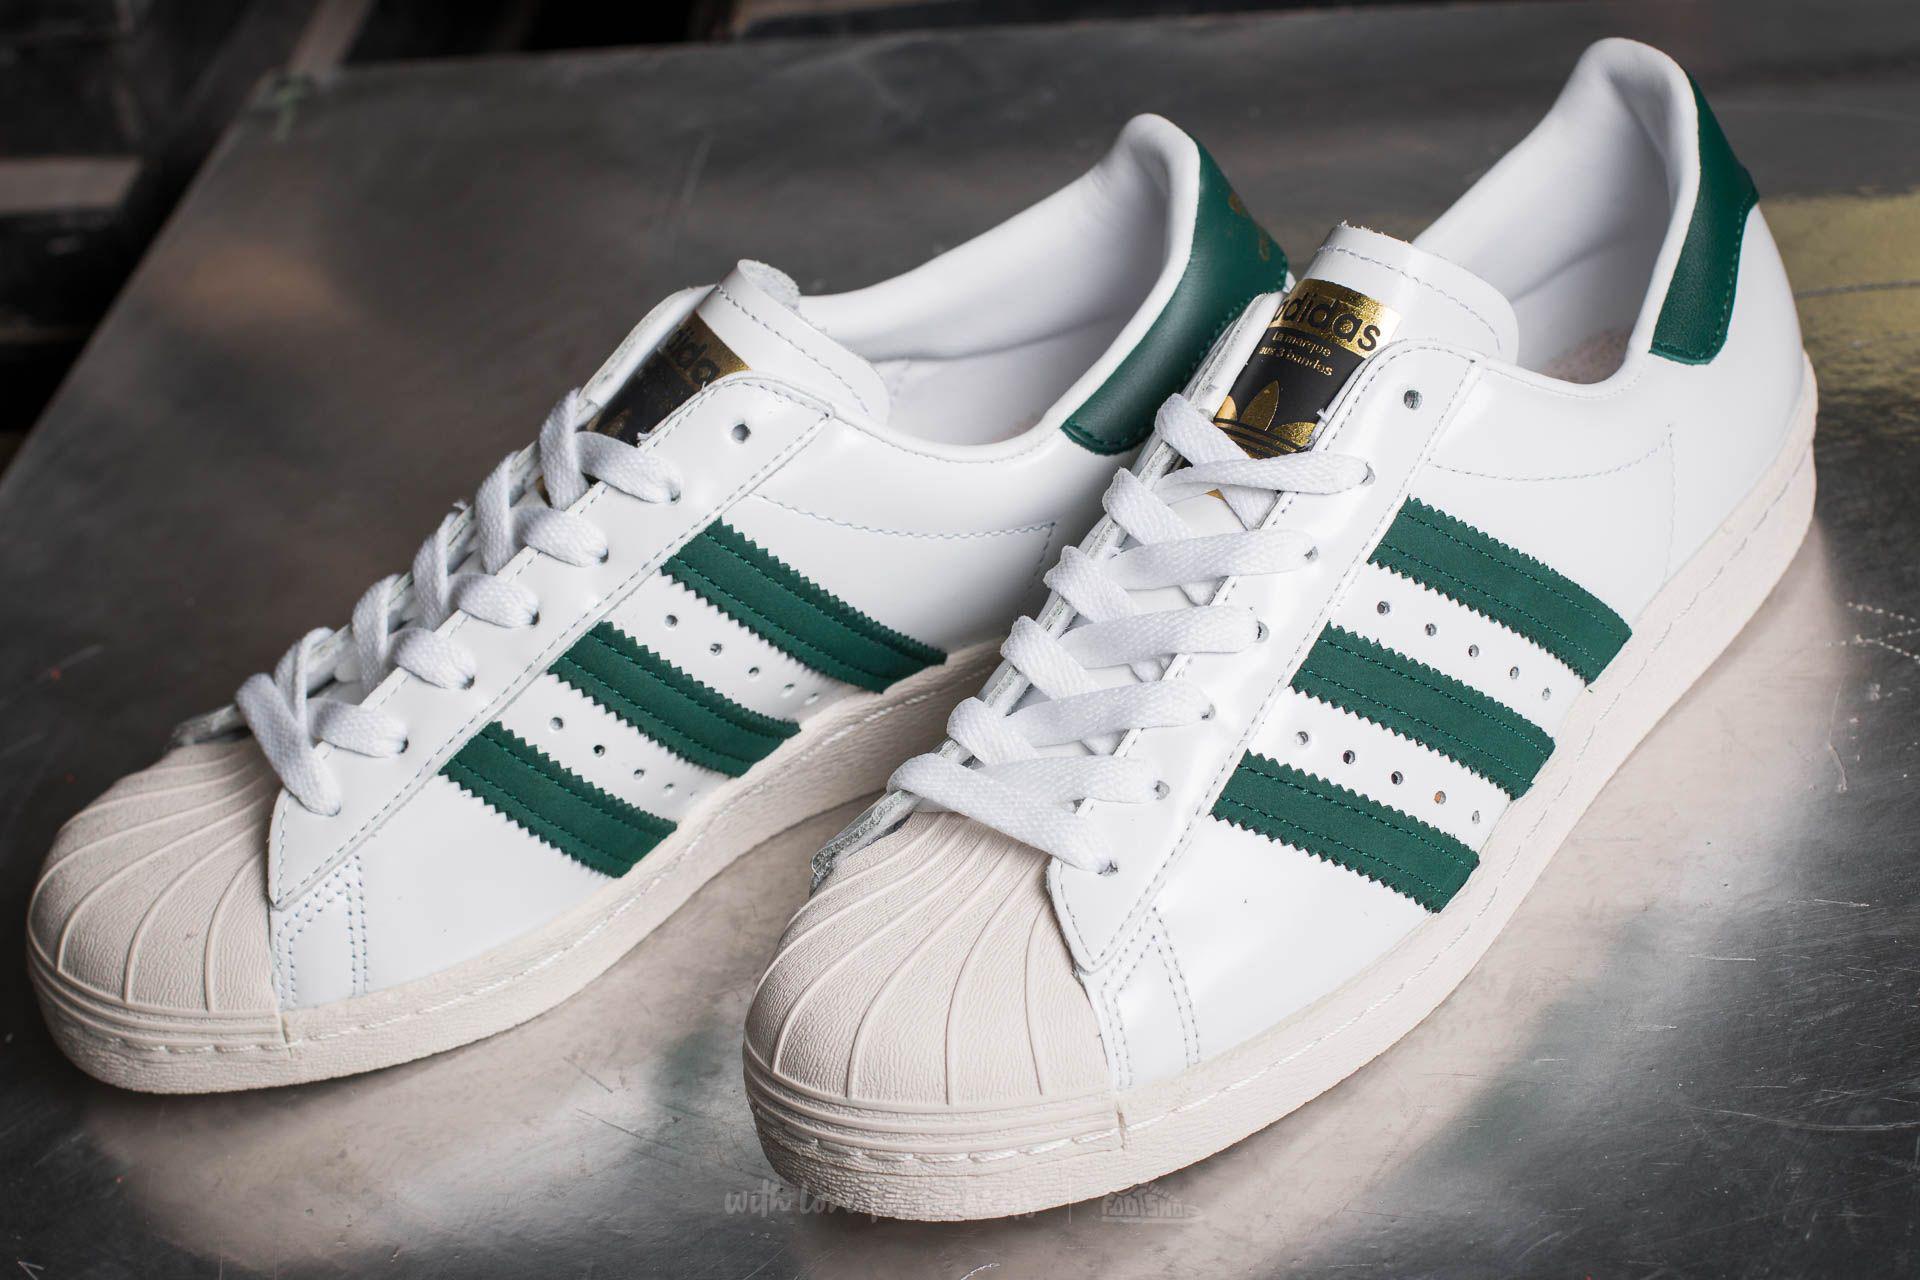 size 40 4232e 98f36 ... usa lyst adidas originals adidas superstar 80s ftw white collegiate  7f314 132a2